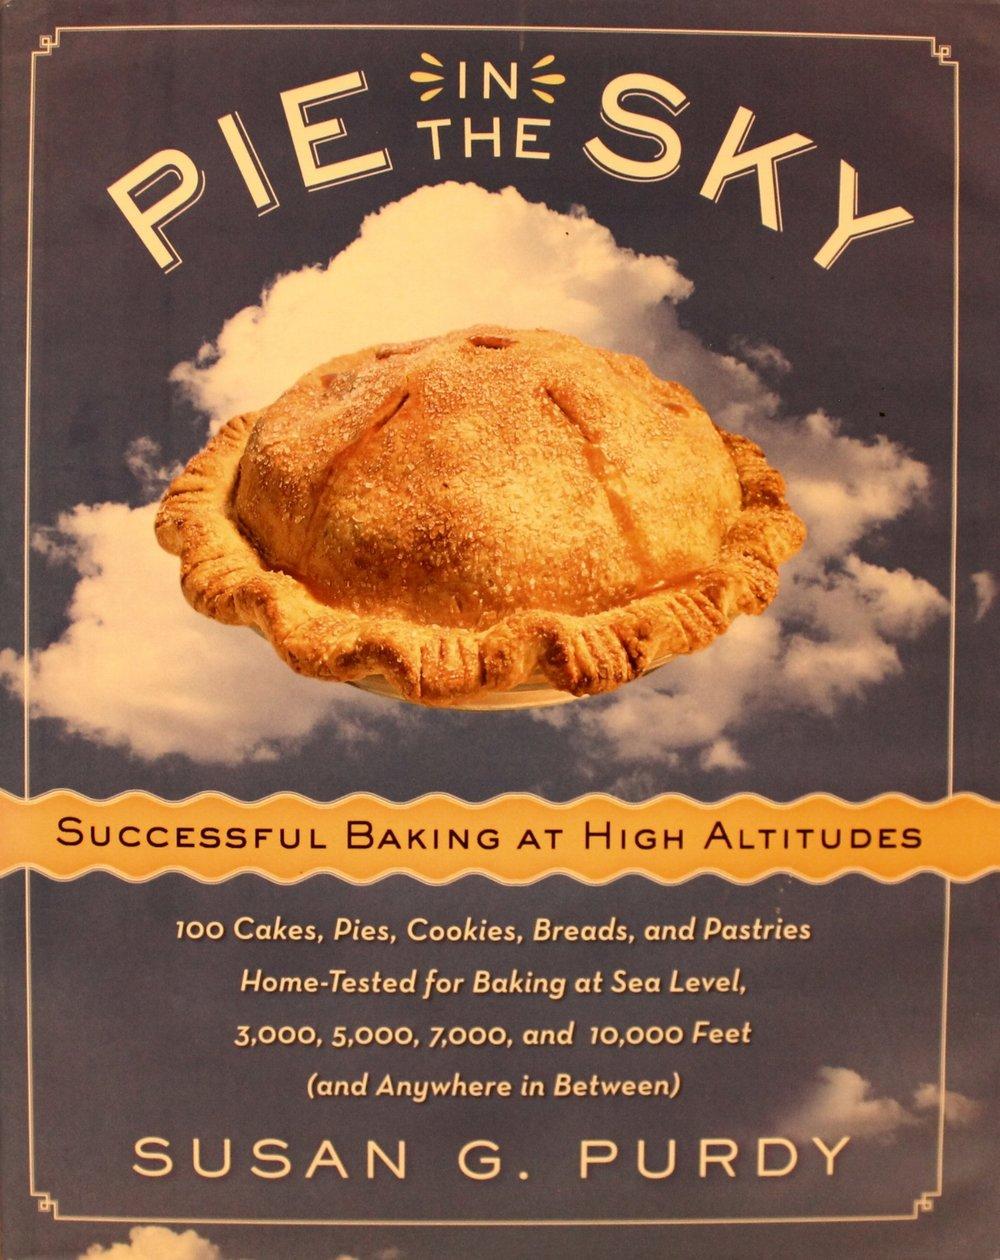 pie in the sky by susan purdy.jpg